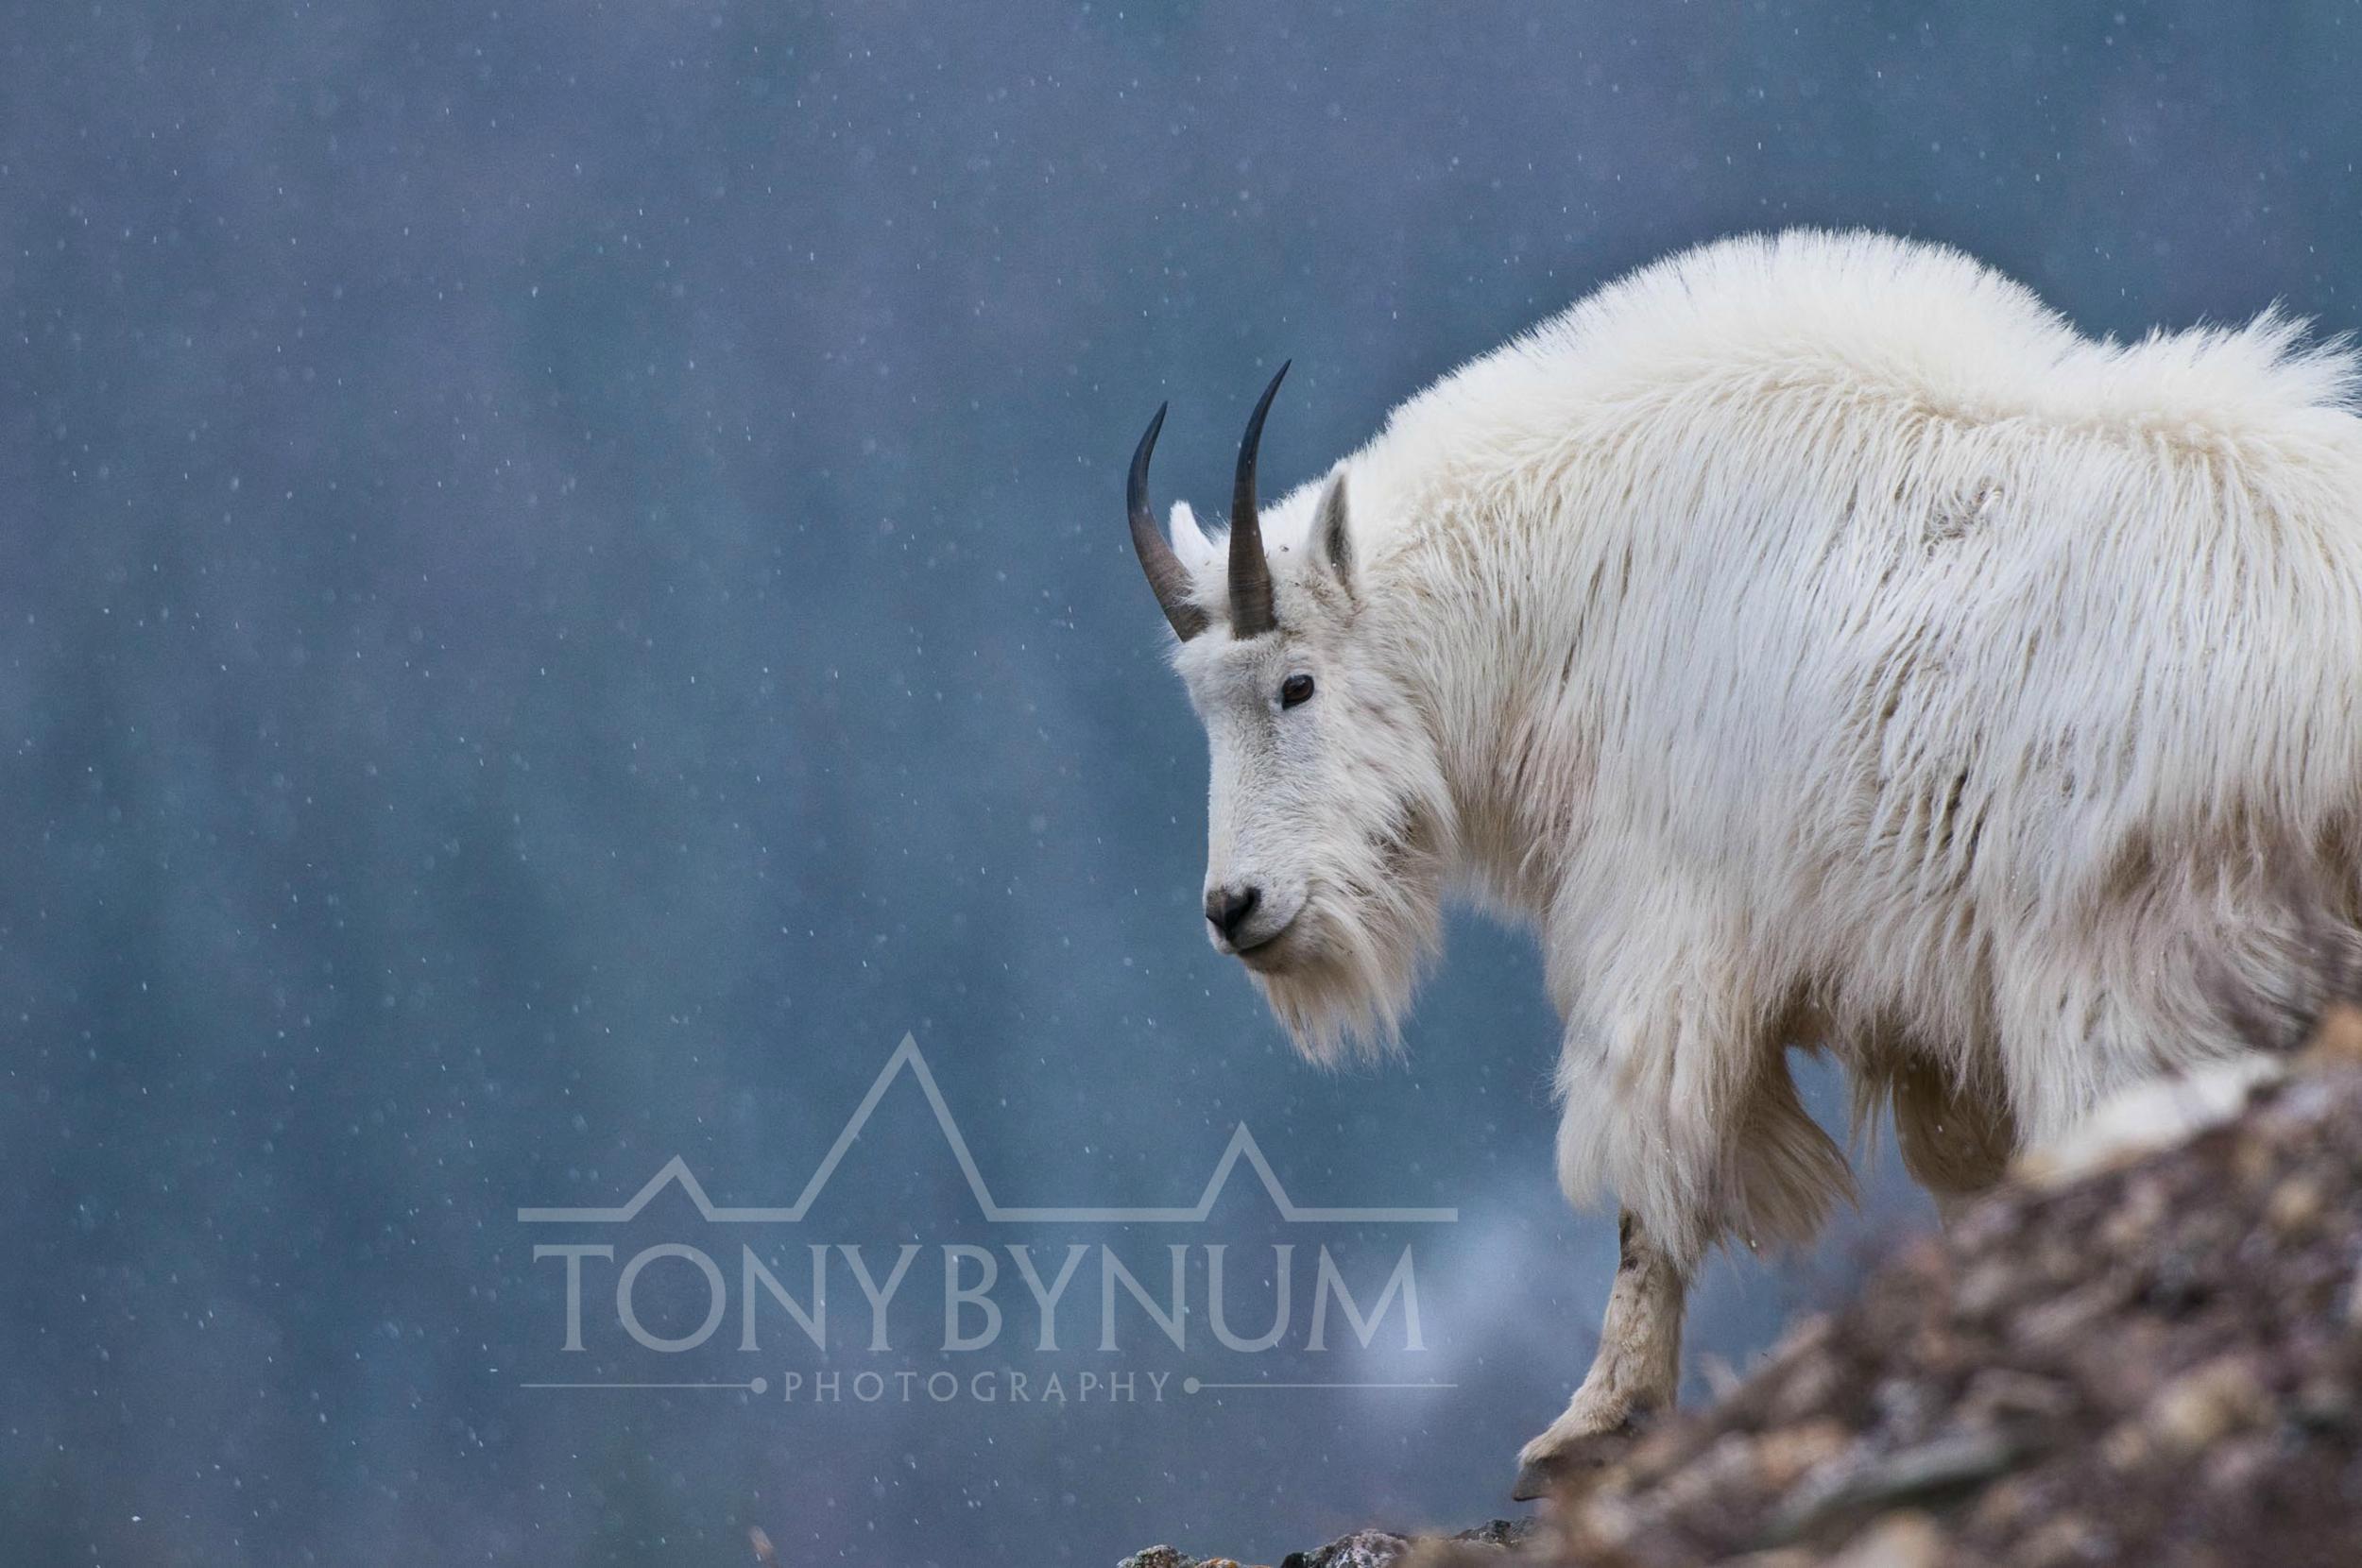 Copyright - Tony Bynum Photography